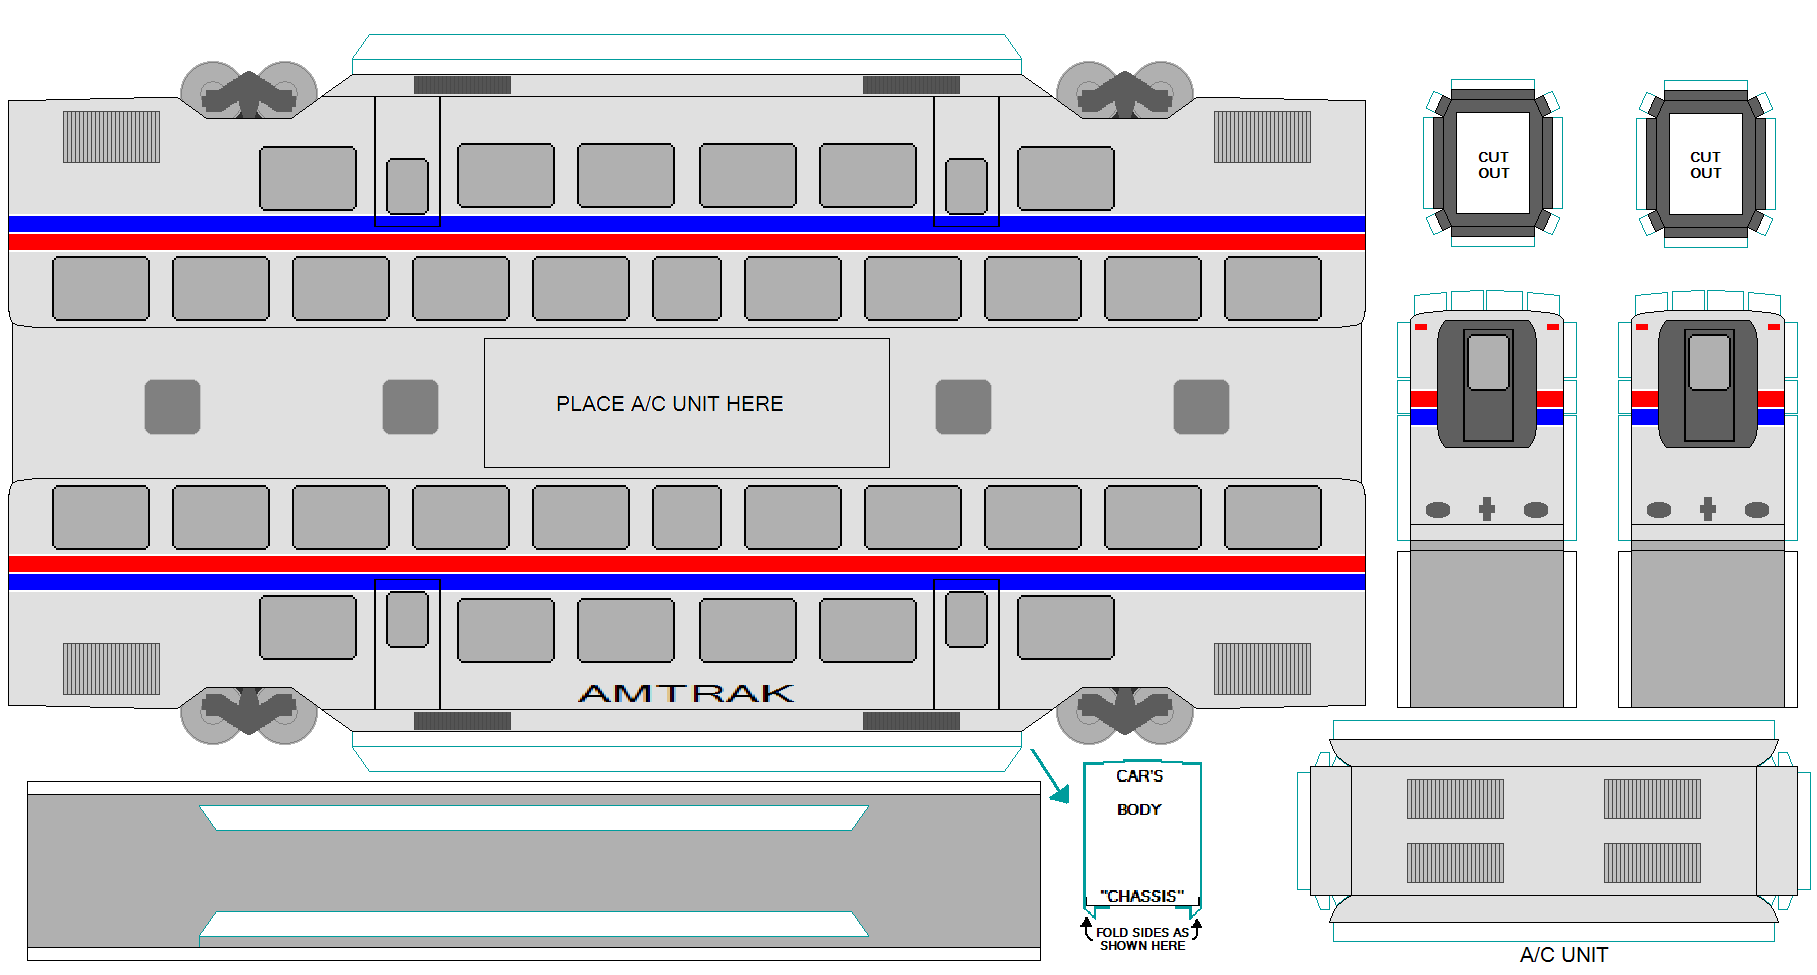 Amtrak_80__sColors_bi_level_train_car.PNG